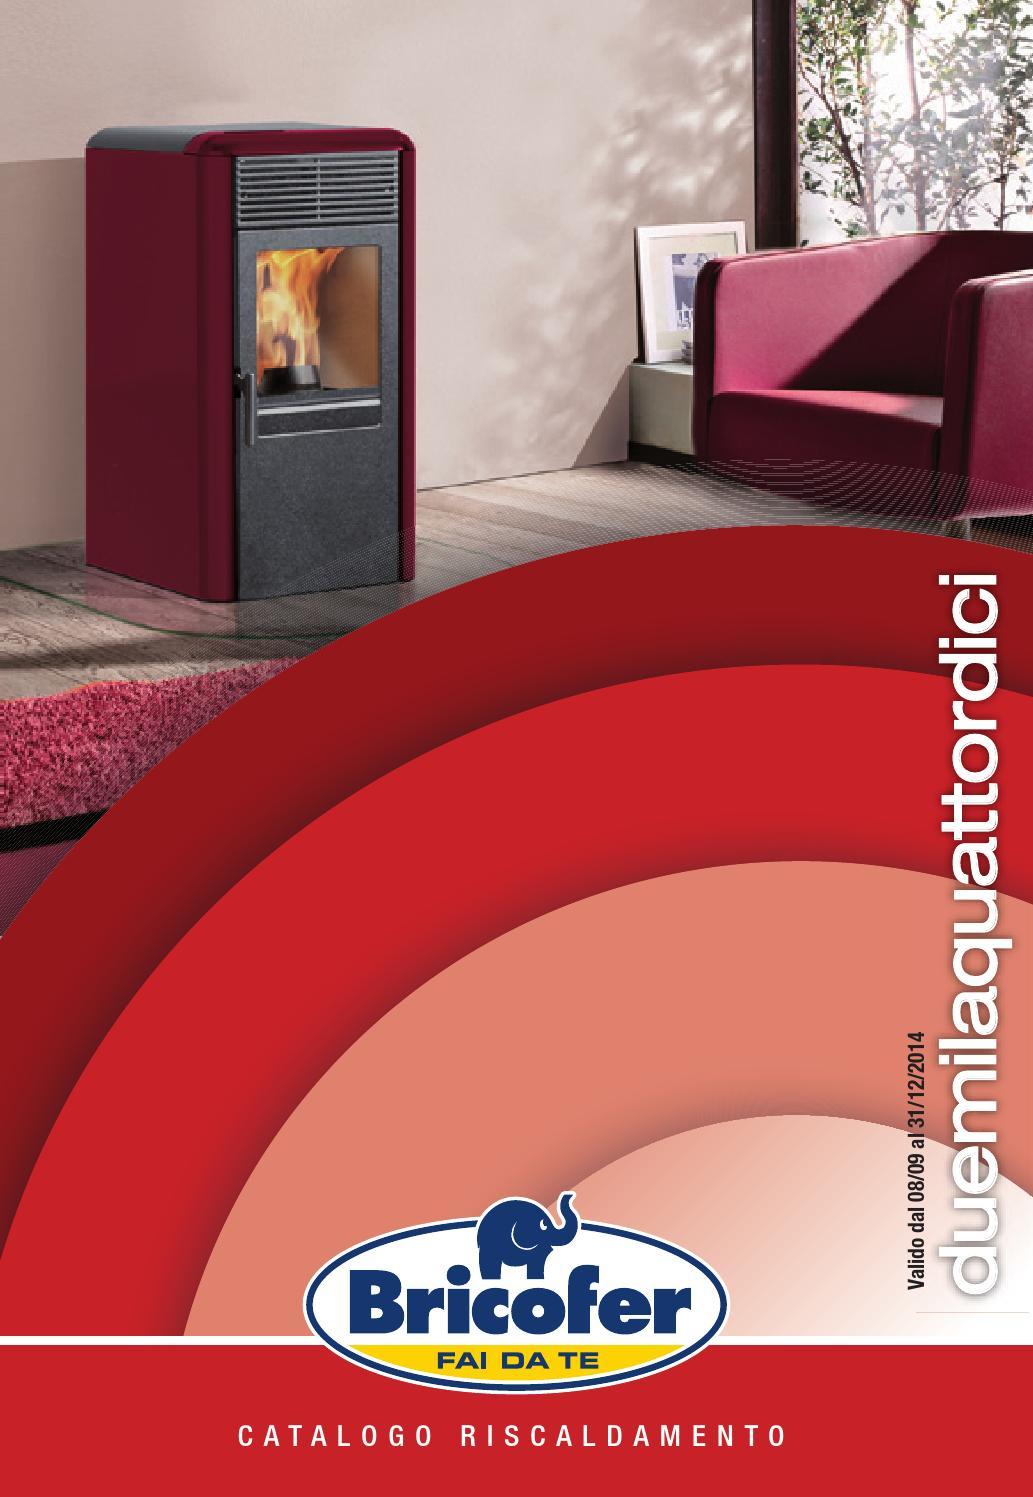 Catalogo riscaldamento 2014 by bricofer italia spa issuu for Catalogo bricofer